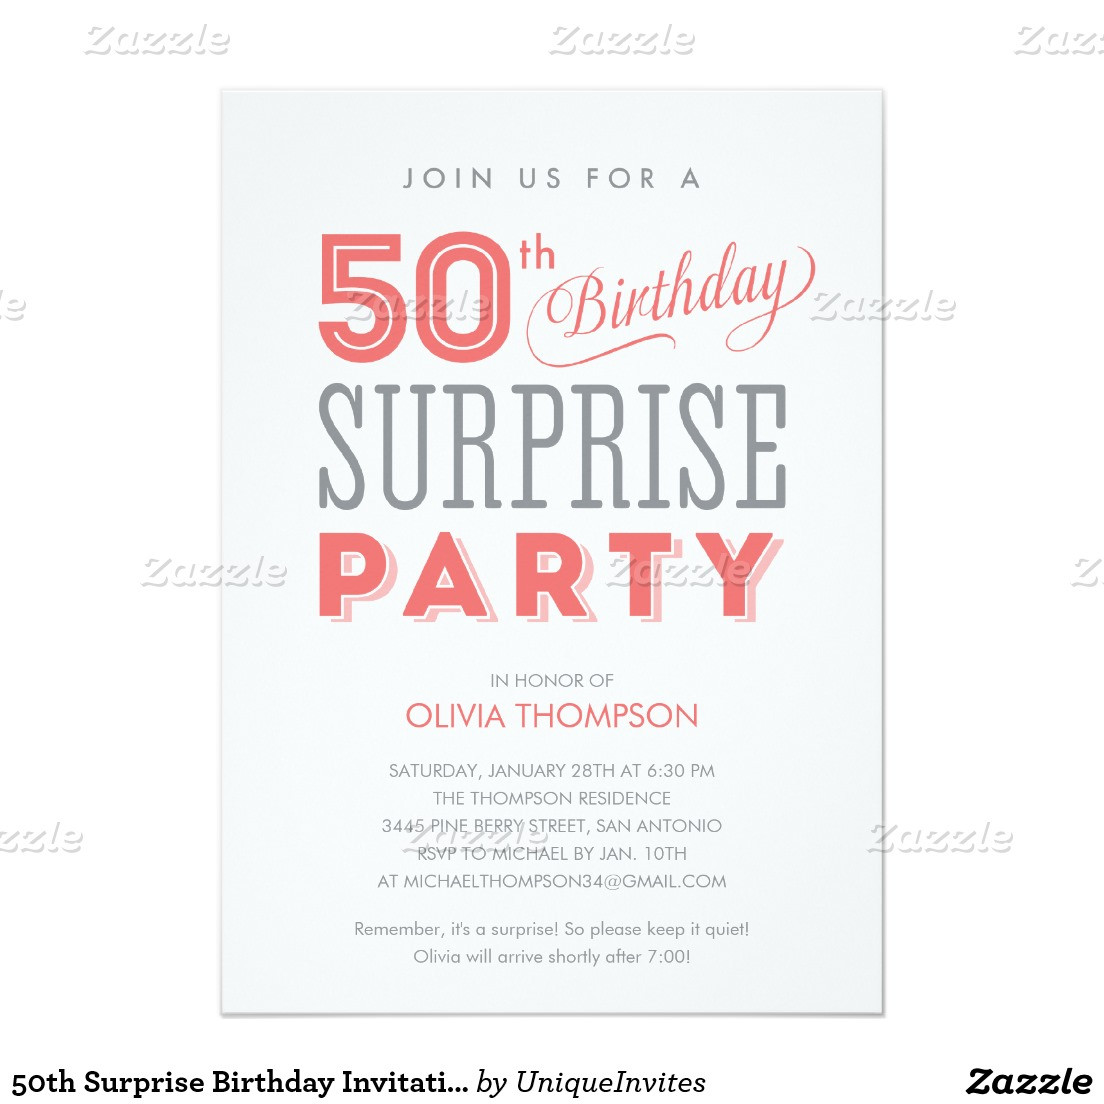 50th Birthday Invitation Wording  Surprise 50th Birthday Party Invitation Wording